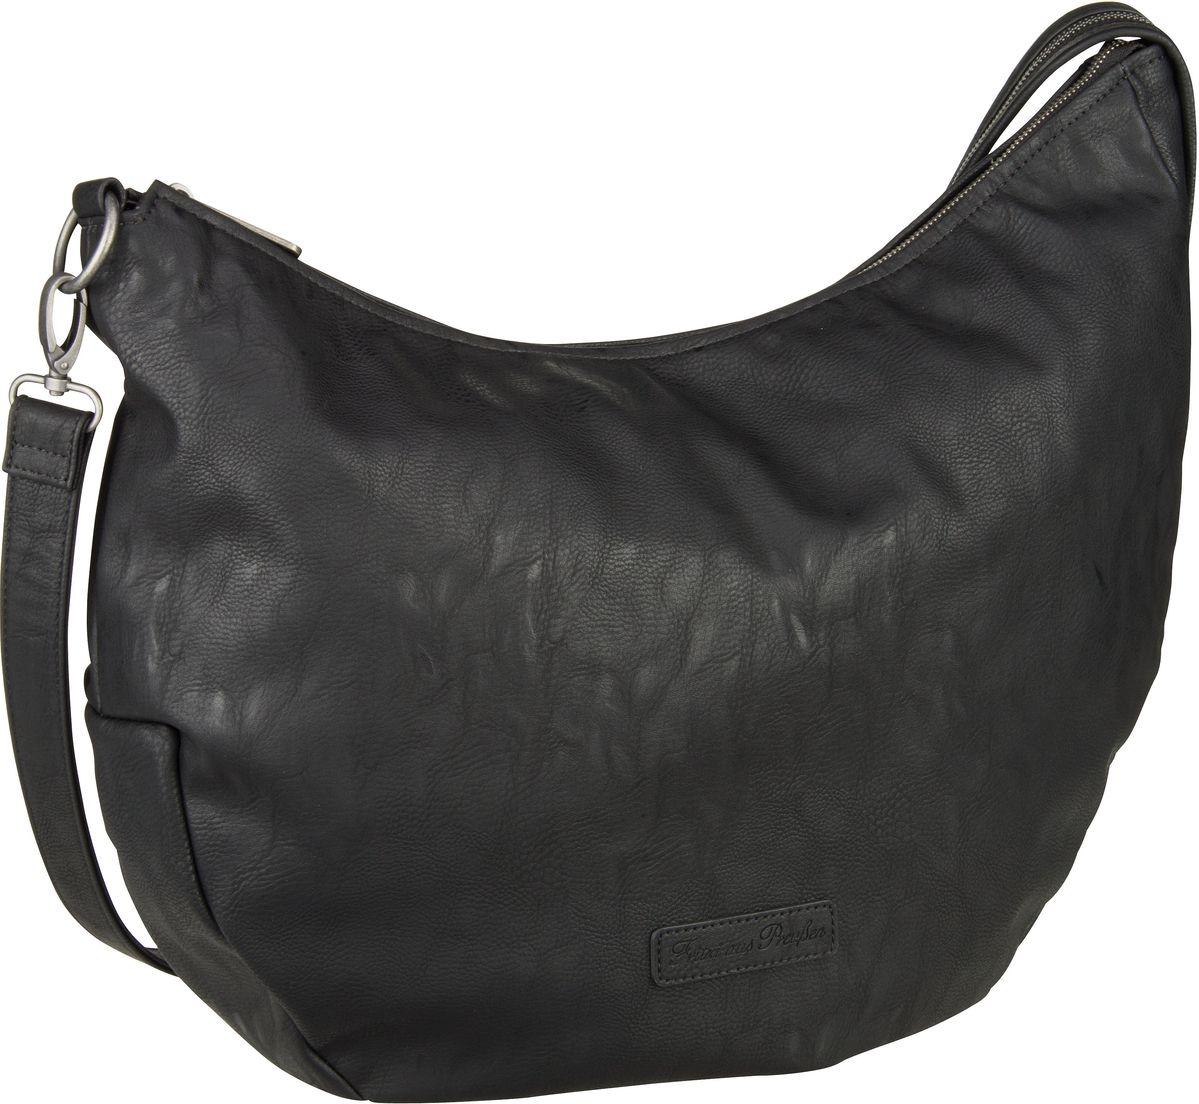 Handtasche Fine Saddle Black